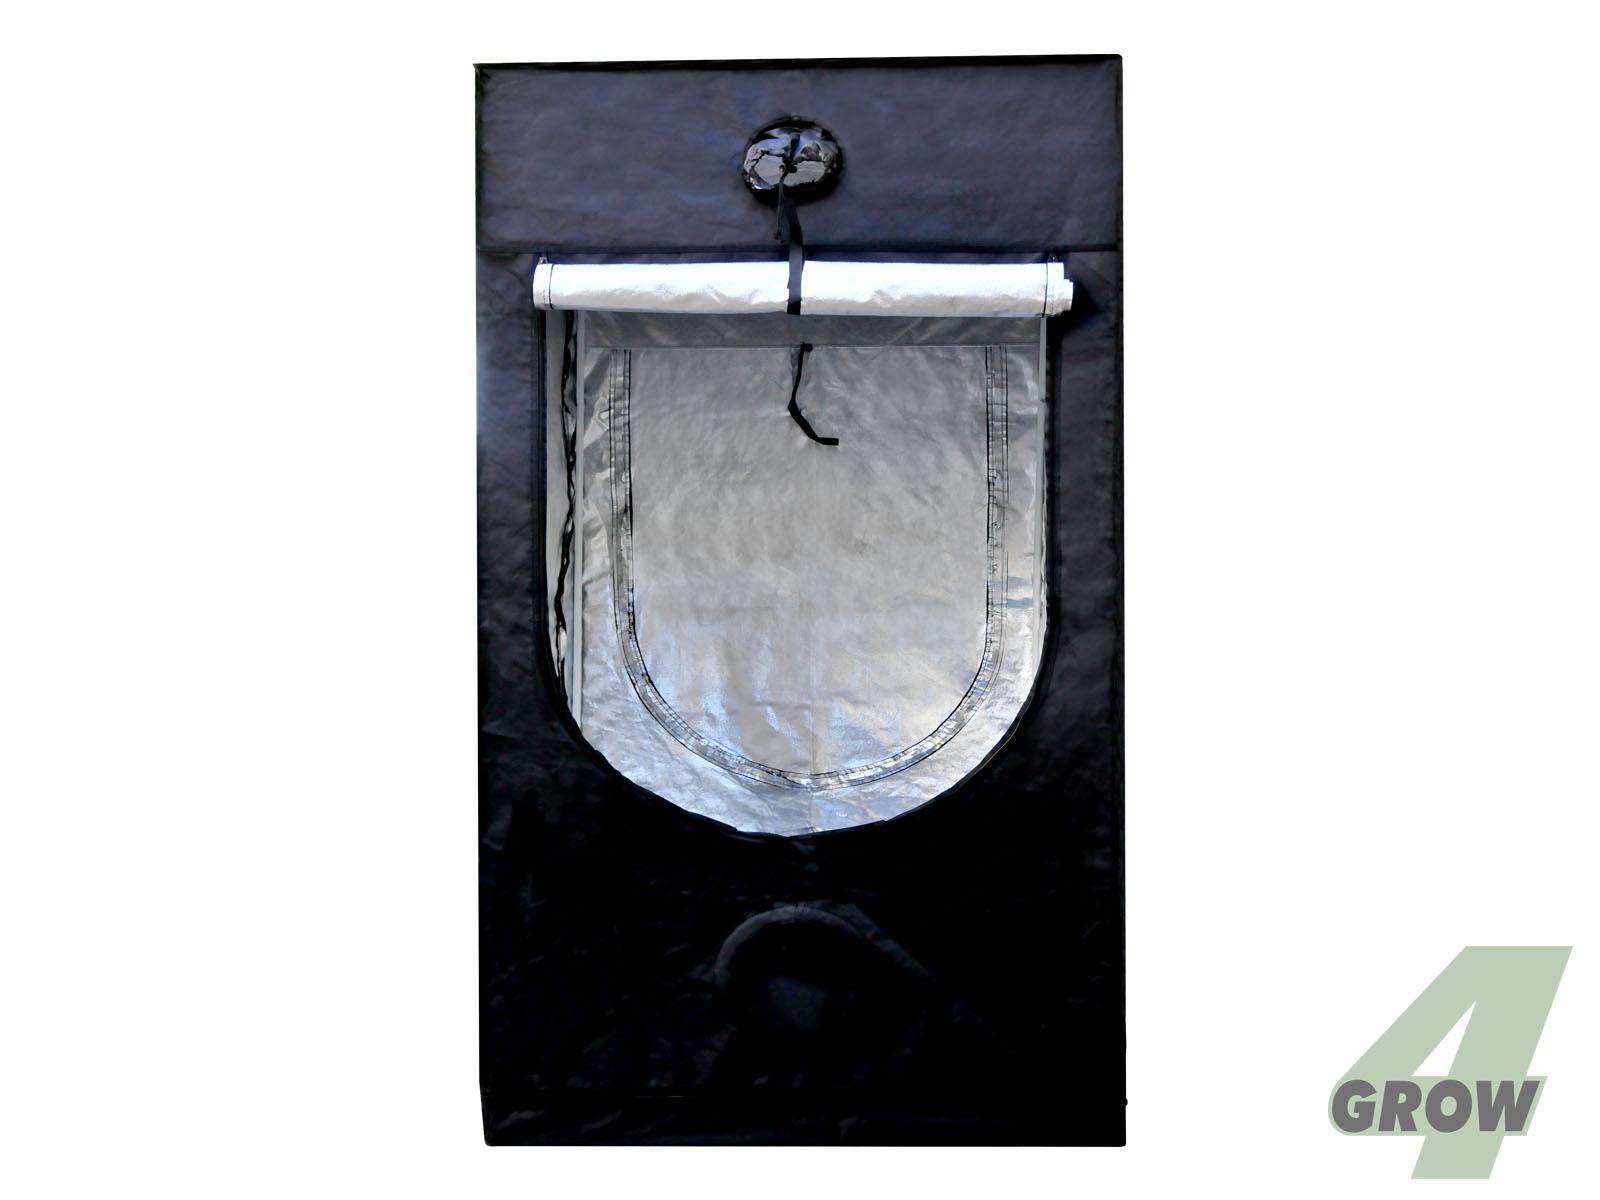 pflanzenlampe led pflanzenlampe pflanzenzelt growshop growbox 4grow bs 60. Black Bedroom Furniture Sets. Home Design Ideas